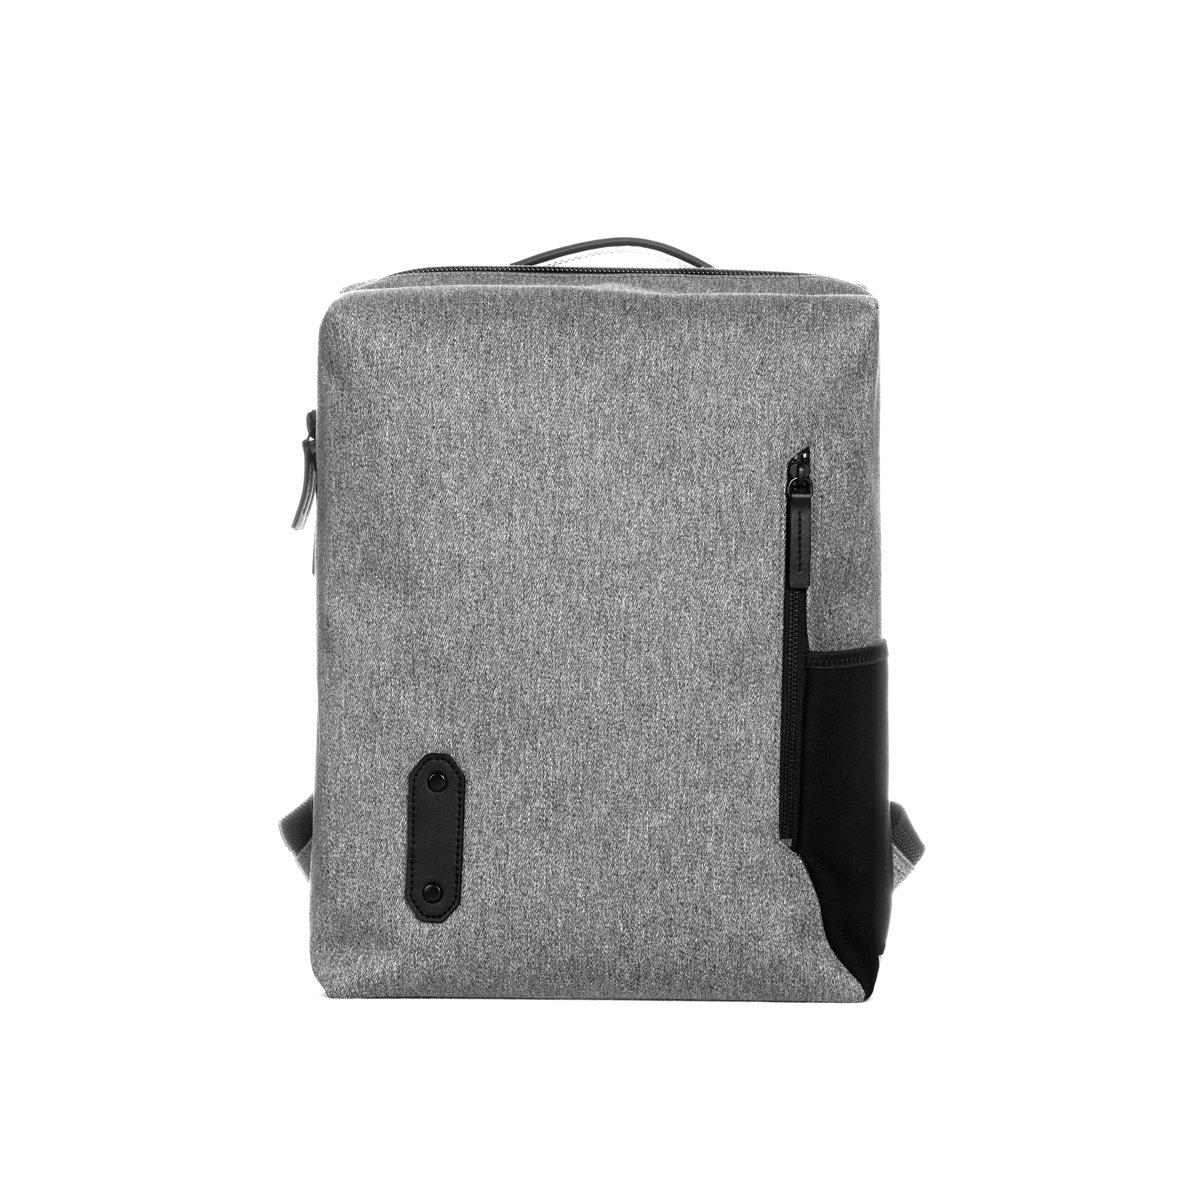 VENQUE (ヴェンク) バックパック リュックサック THE BOX - GREY 国内正規取扱店 1年間製品保証付き   B07F3TJ9LF